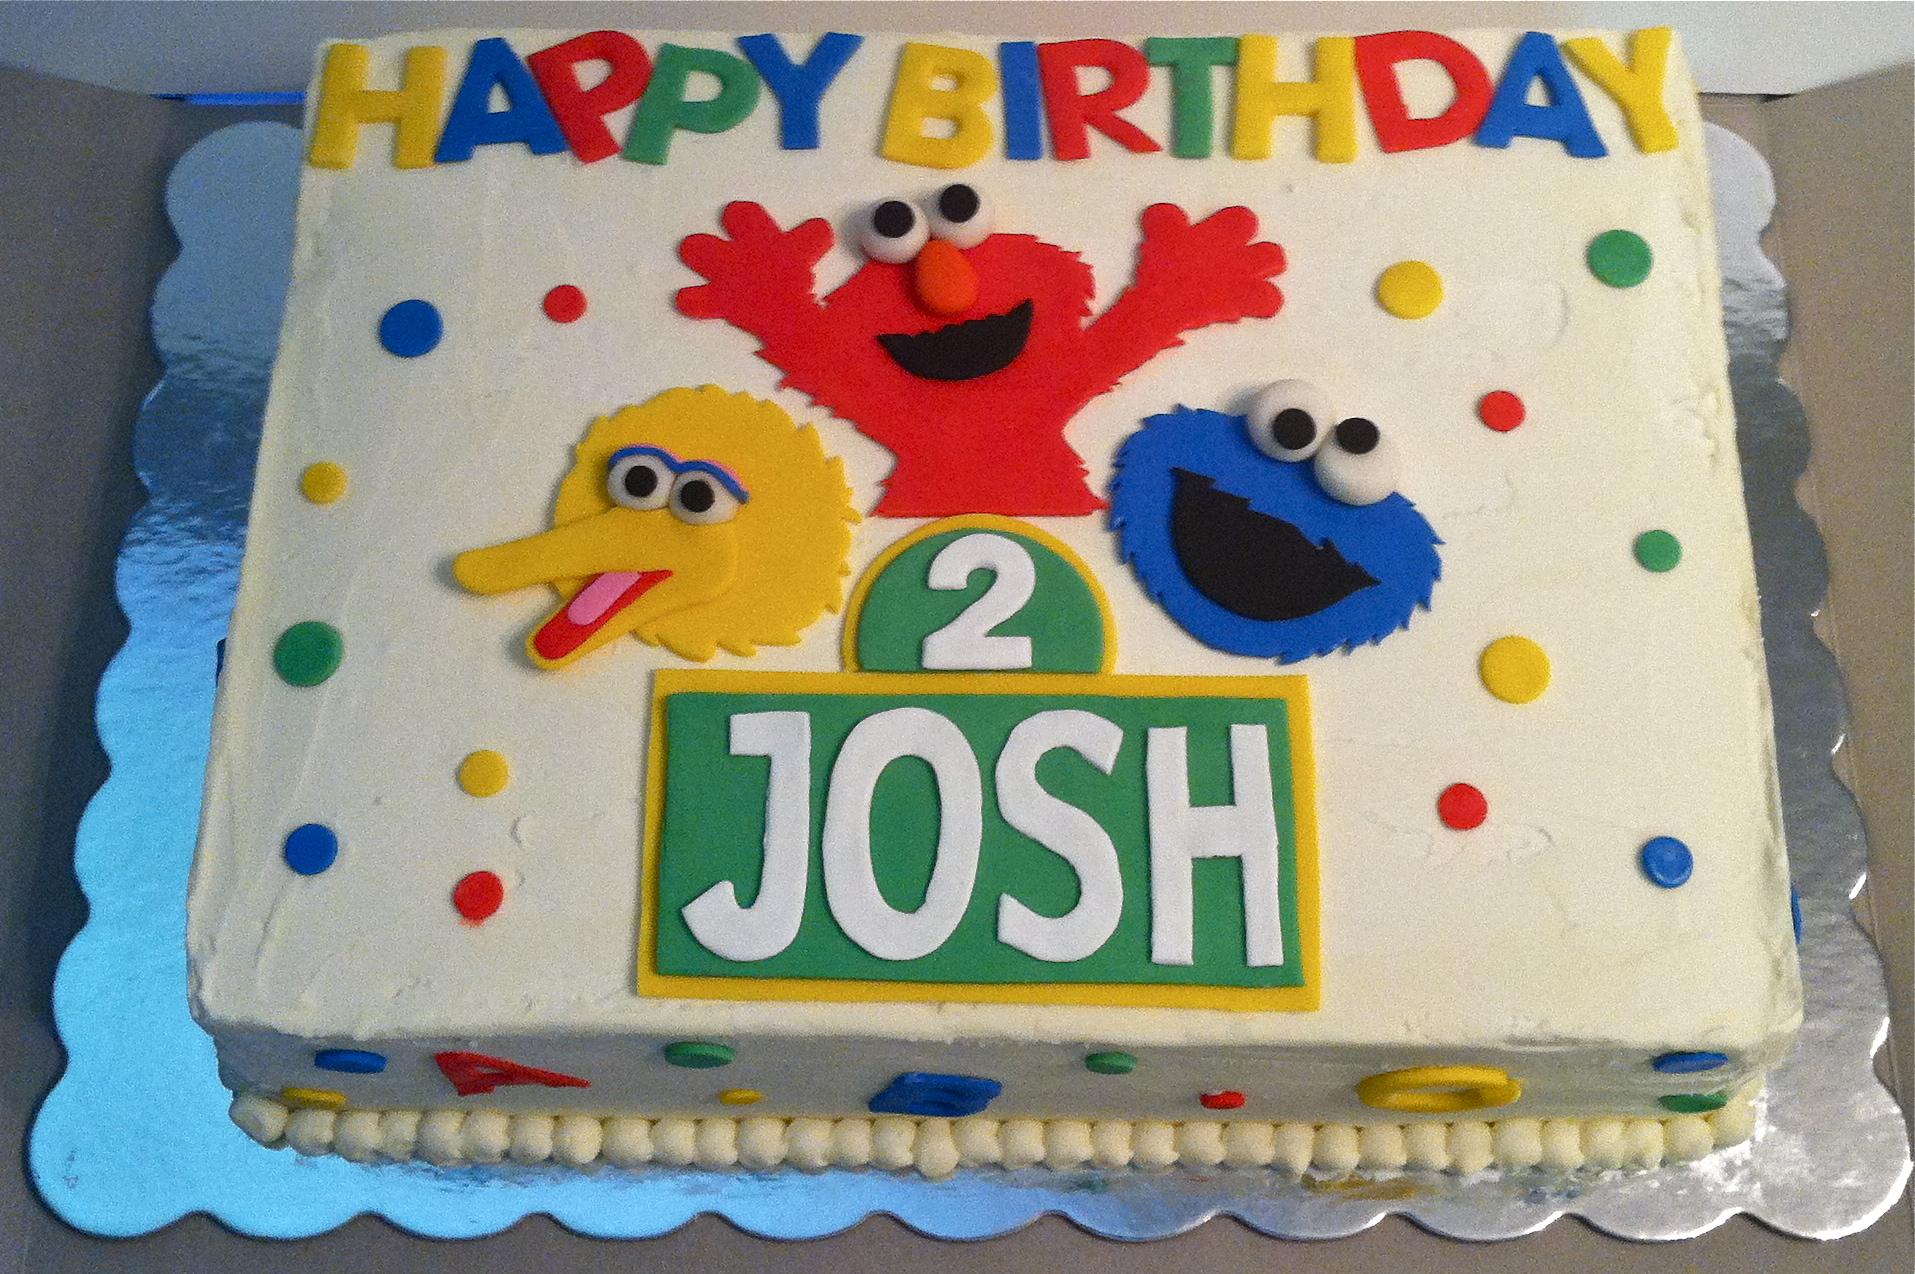 Cake Decorating Sesame Street Birthday : Sesame Street Birthday Cake Flickr - Photo Sharing!